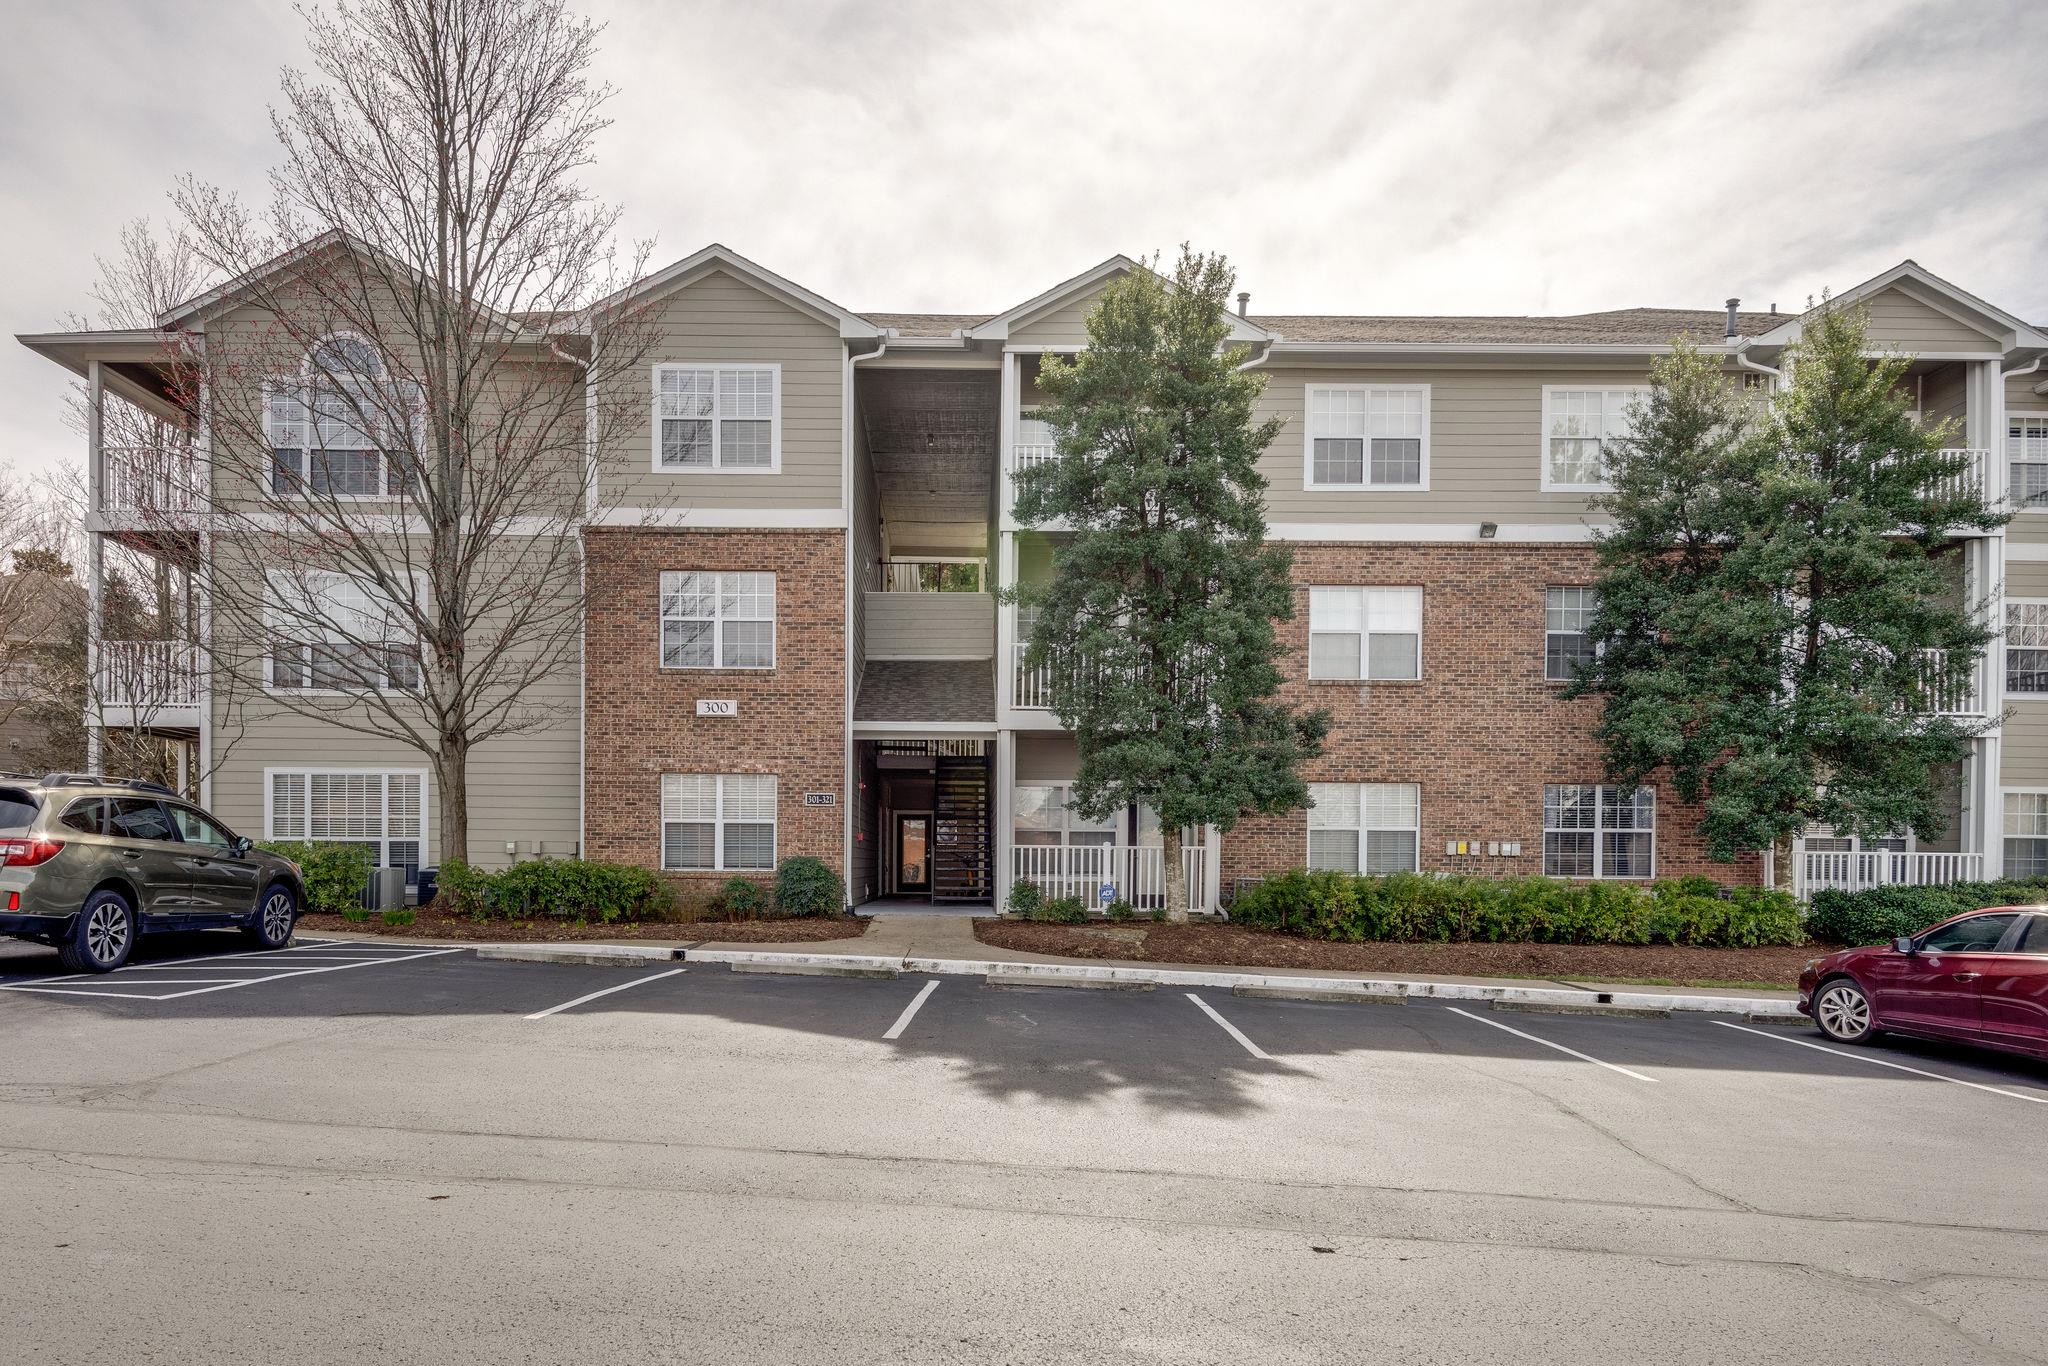 2025 Woodmont Blvd Apt 302, Nashville, TN 37215 - Nashville, TN real estate listing